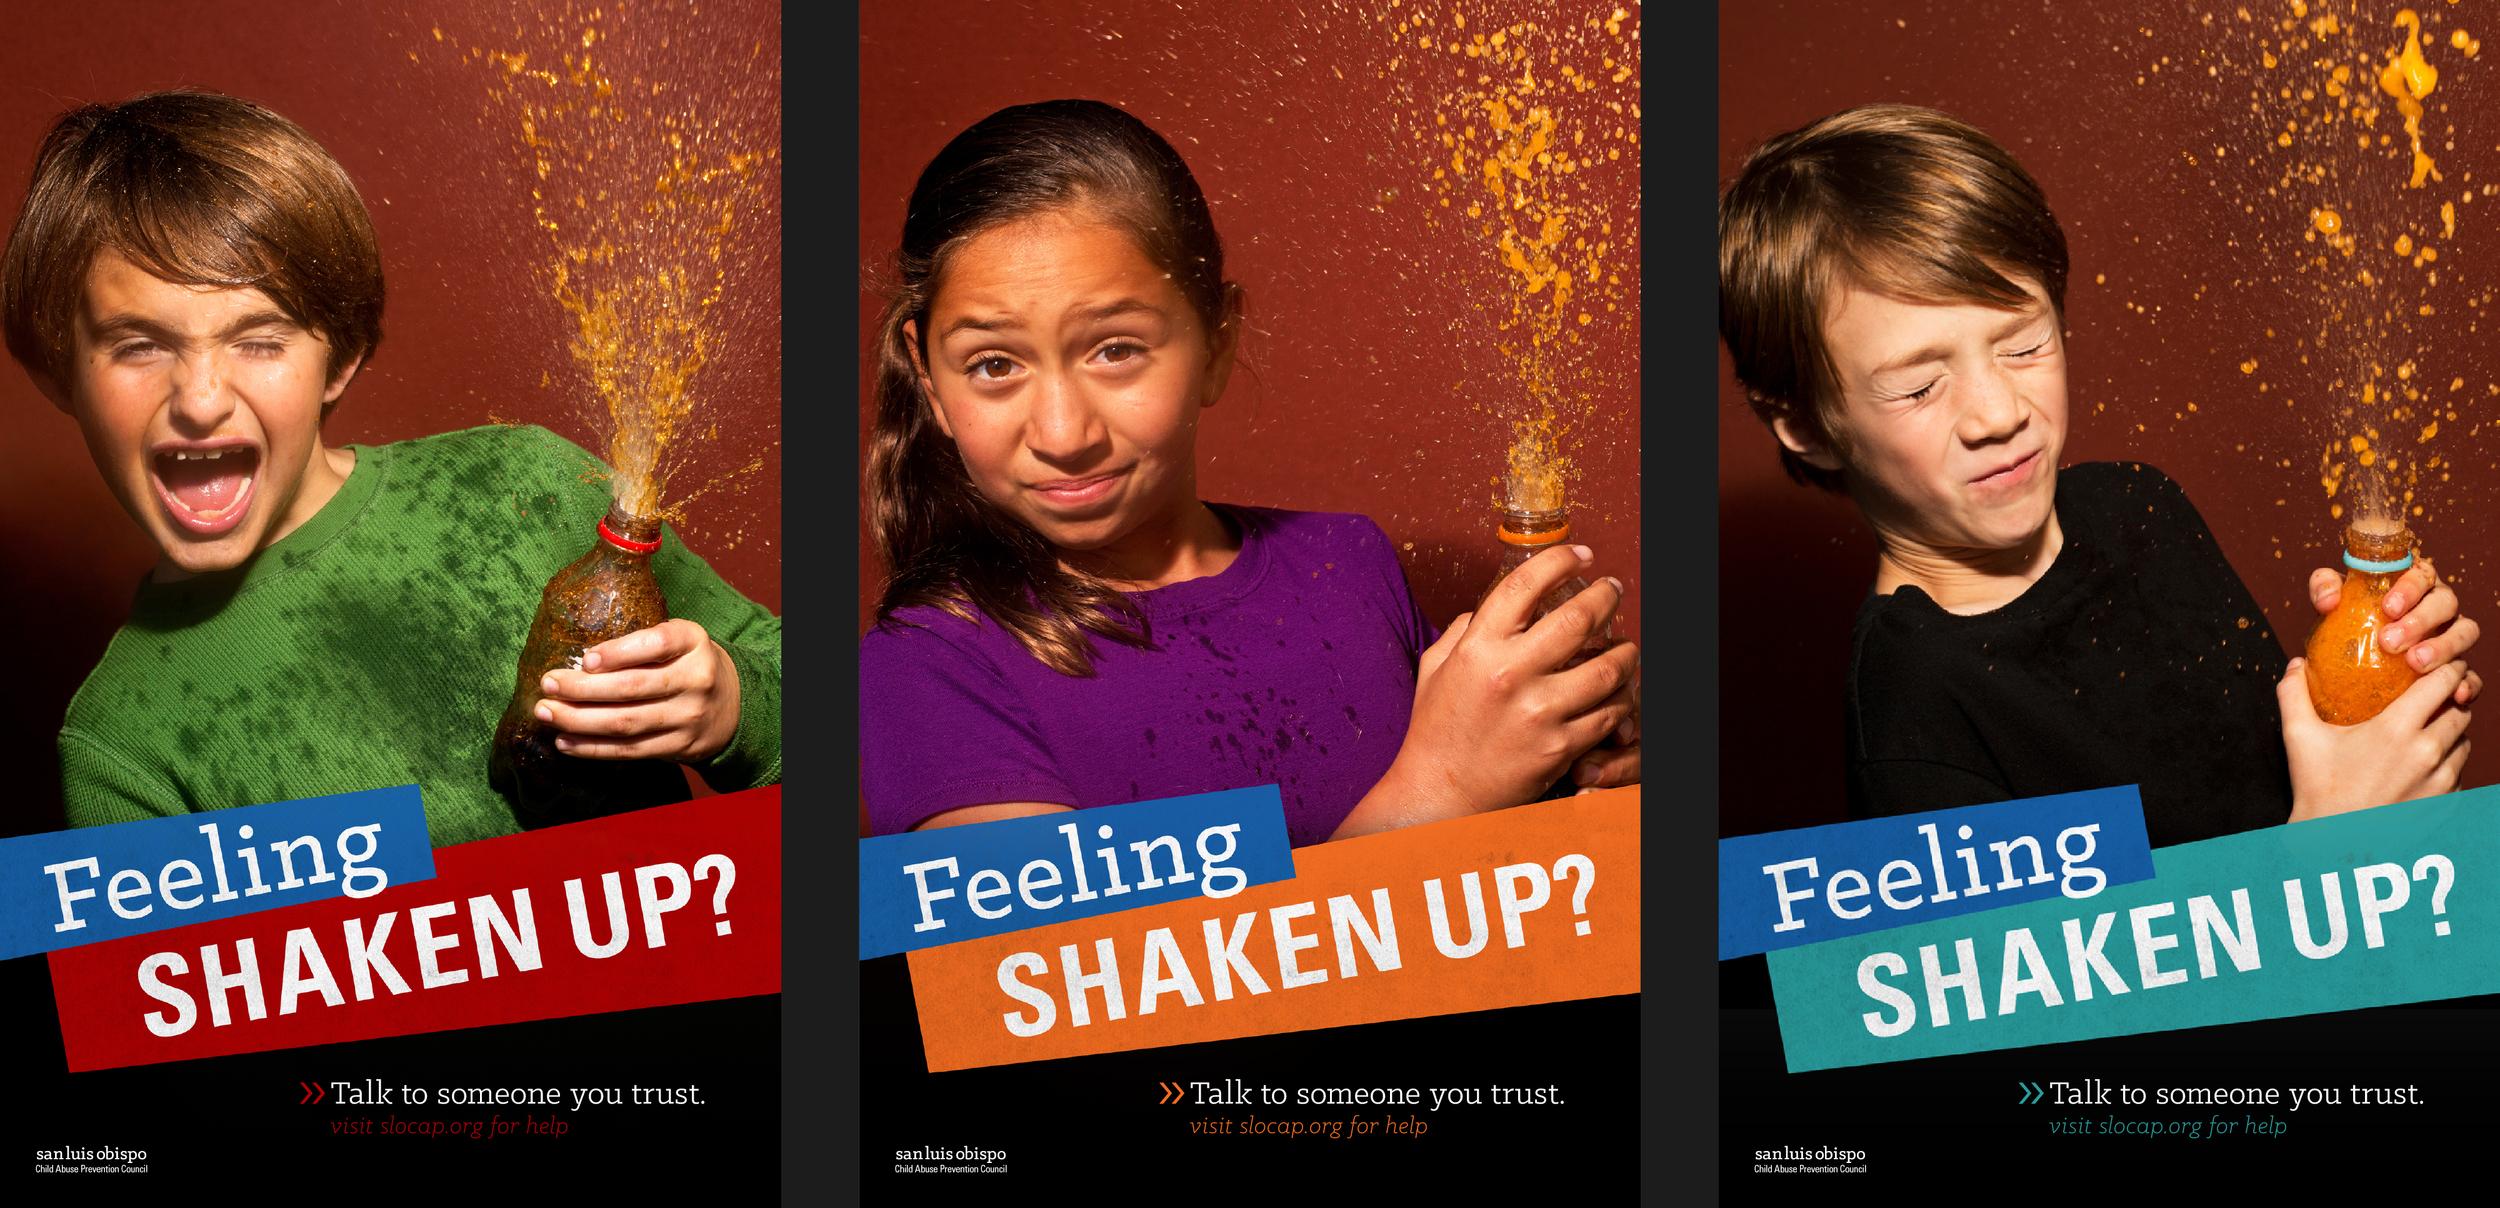 Feeling Shaken Up Posters